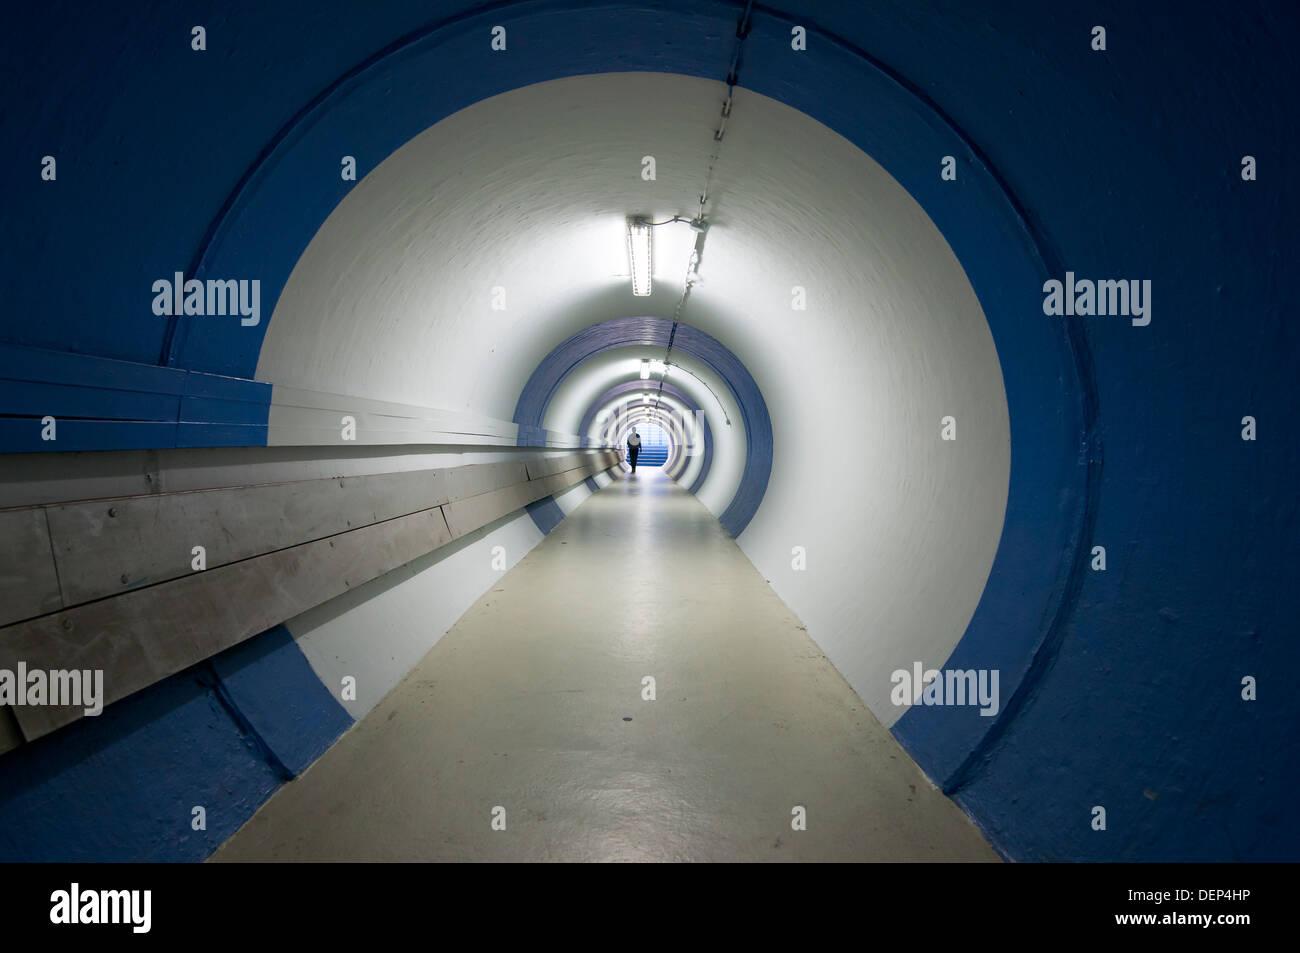 tunnel;Formula 1, Hockenheimring, Hockenheim, Germany, Europe - Stock Image